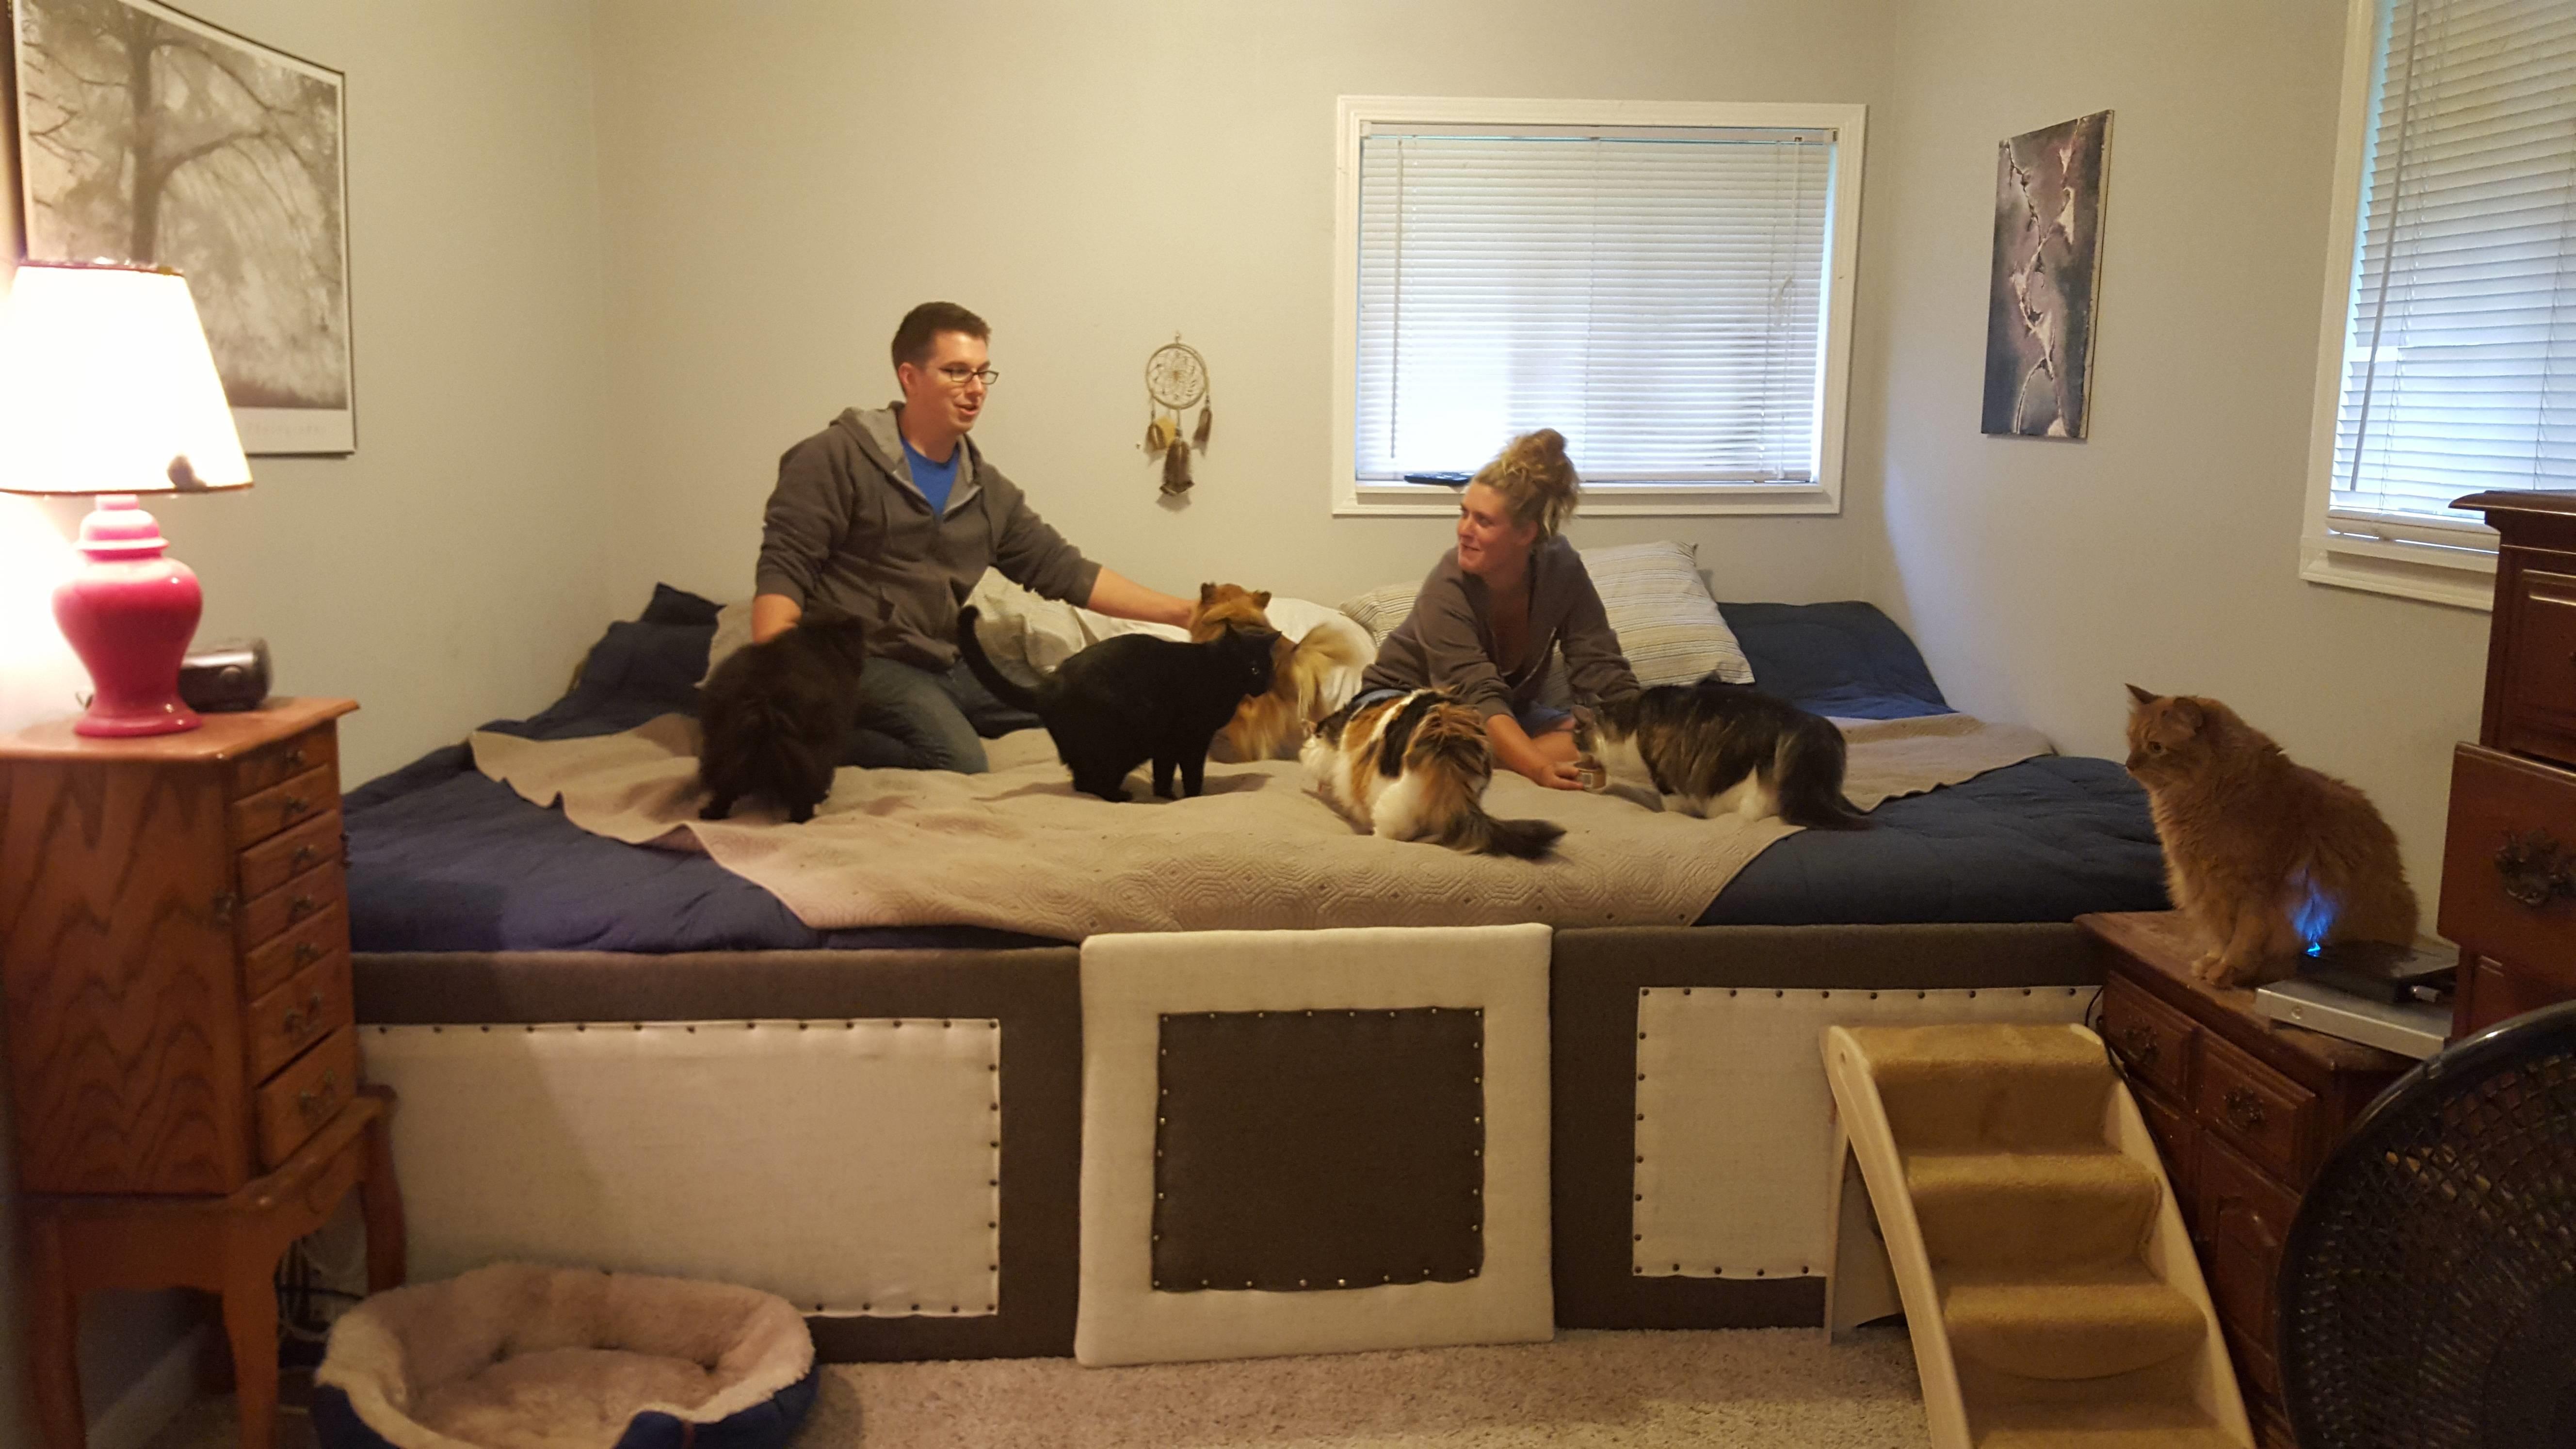 Pareja crea cama gigante para poder dormir con sus mascotas - Escaleras para perros pequenos ...